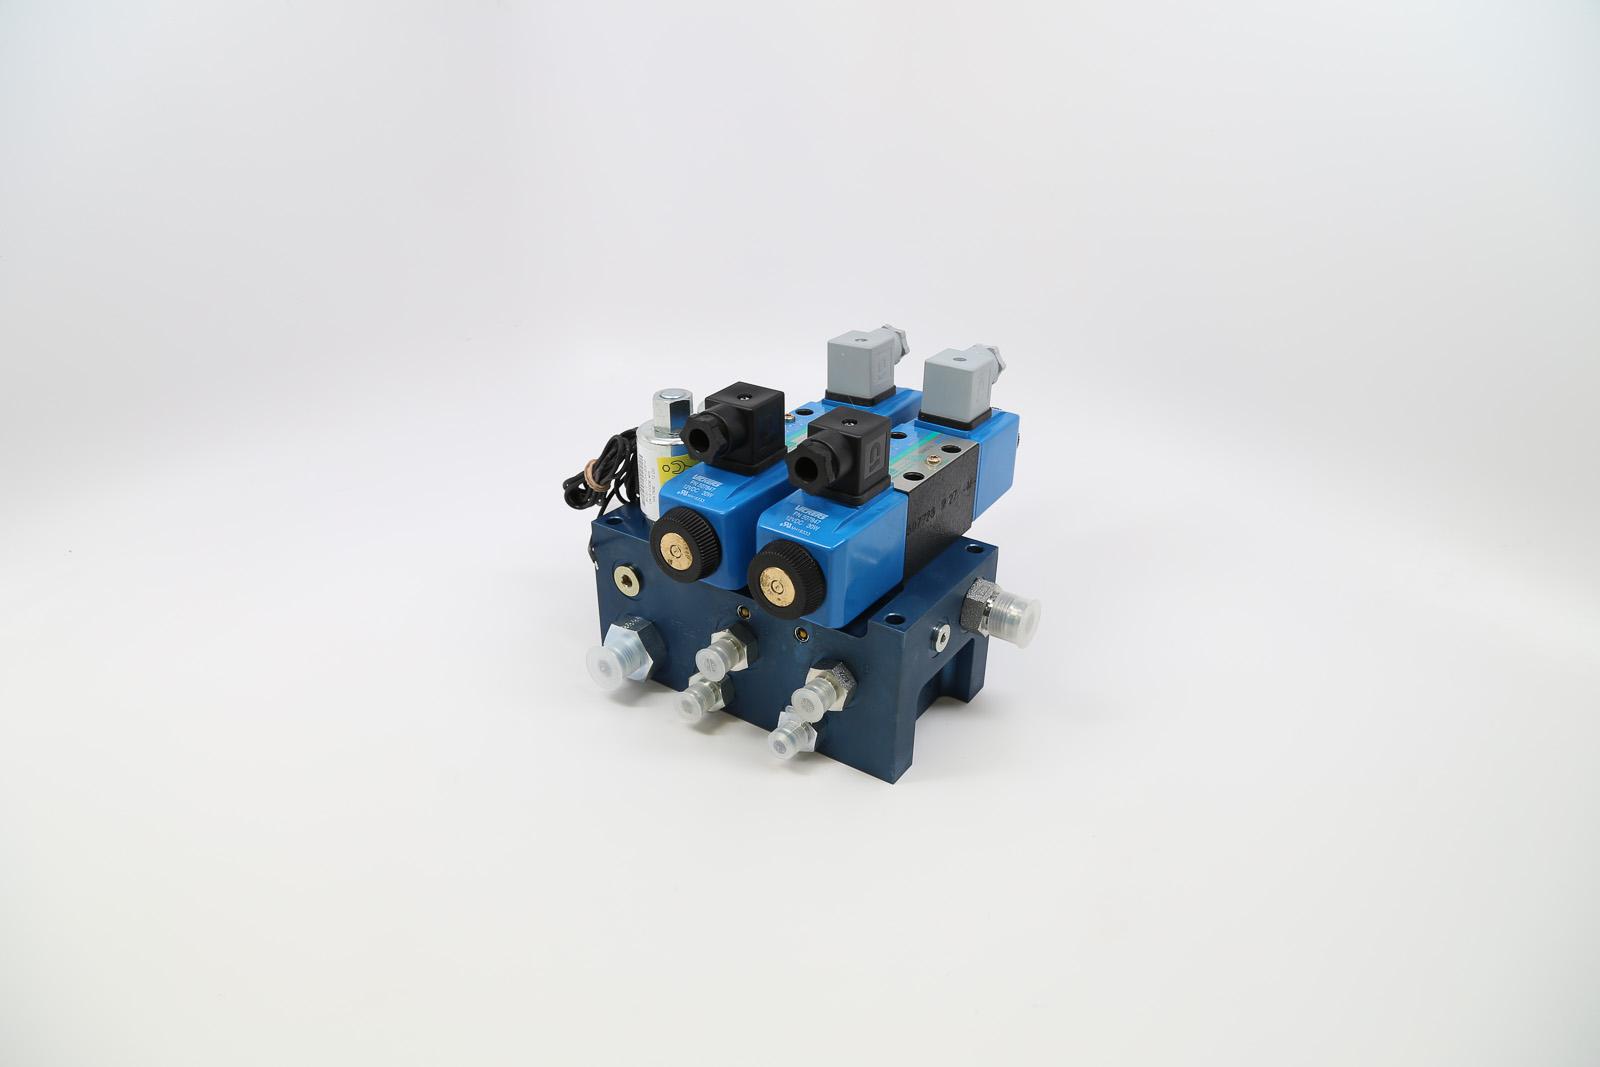 960-1001 -2